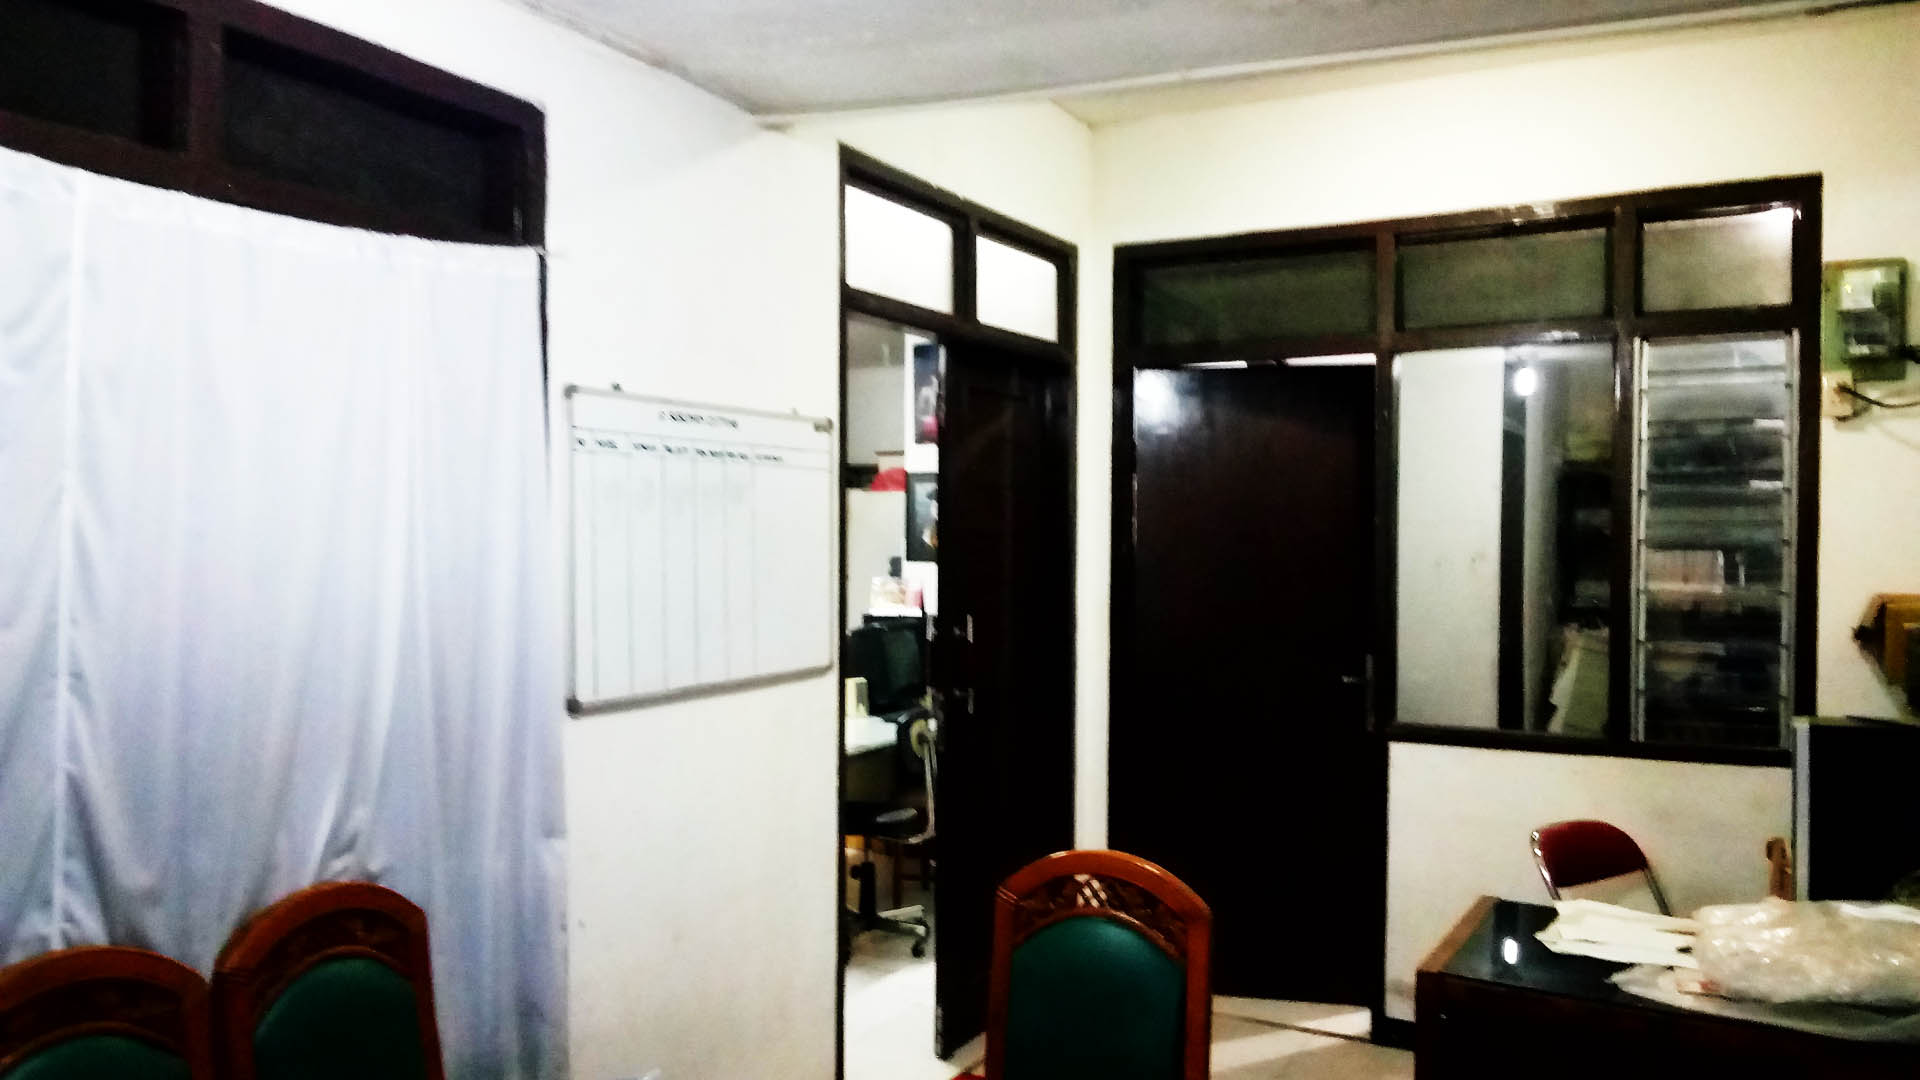 Jual Rumah Cocok Untuk Dijadikan Kost Bandung, dekat Mall TSM, dekat daerah Turangga Bandung